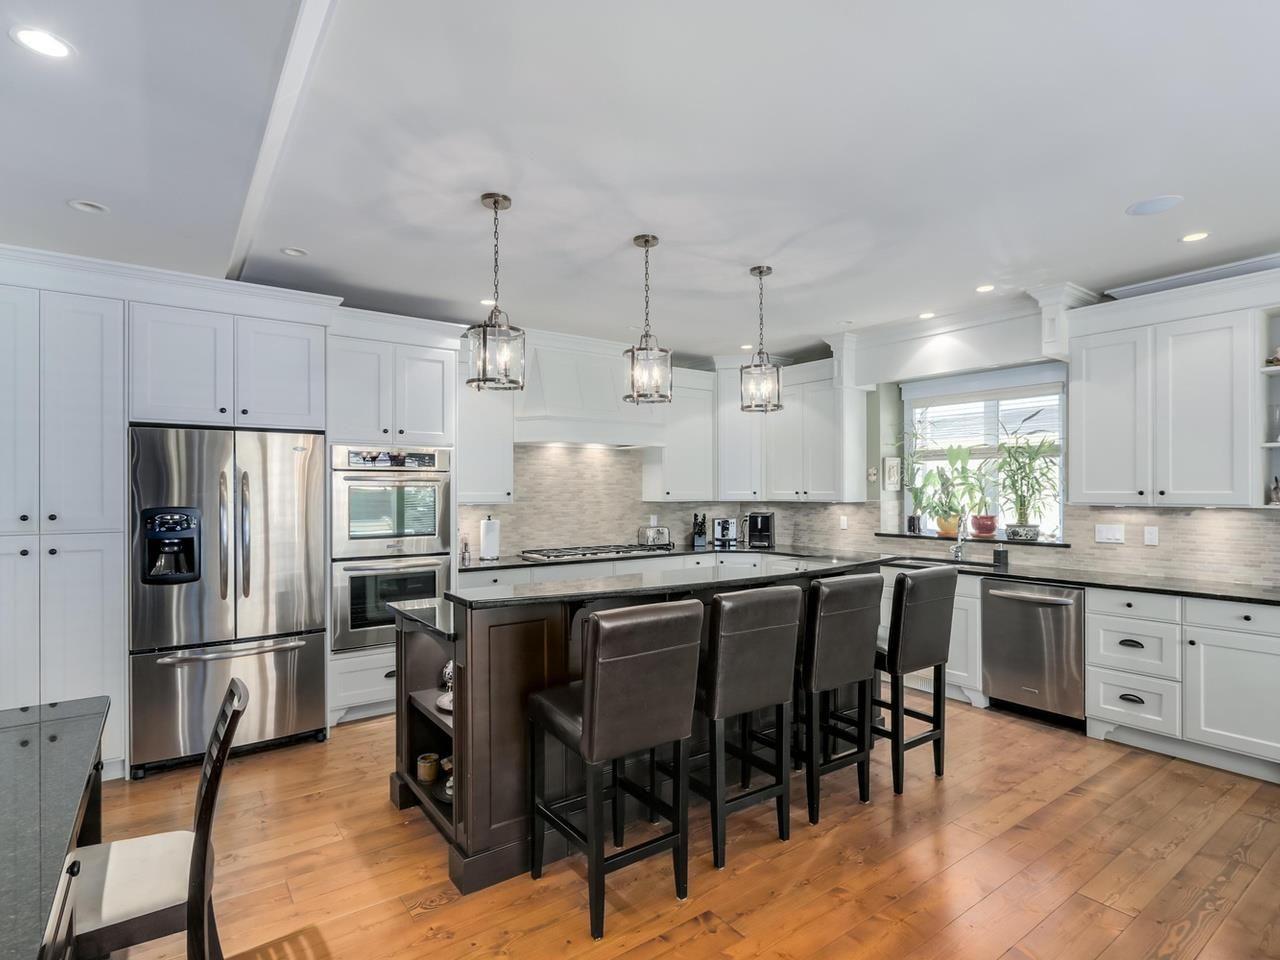 Photo 5: Photos: 13029 14 Avenue in Surrey: Crescent Bch Ocean Pk. House for sale (South Surrey White Rock)  : MLS®# R2070160